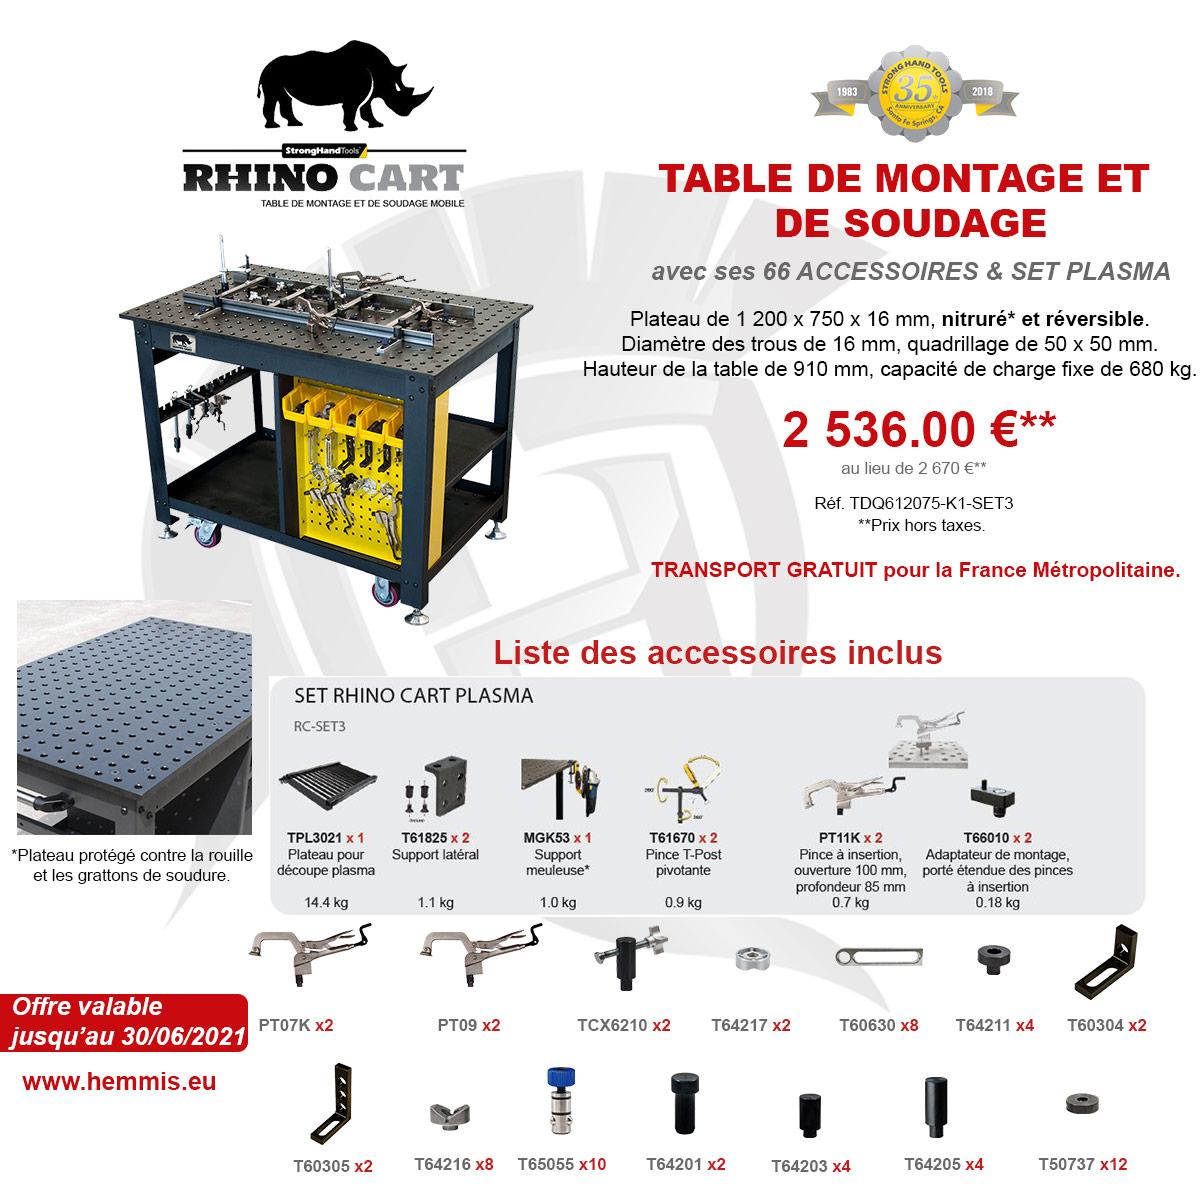 promotion Rhino Cart 2eme trimestre 2021